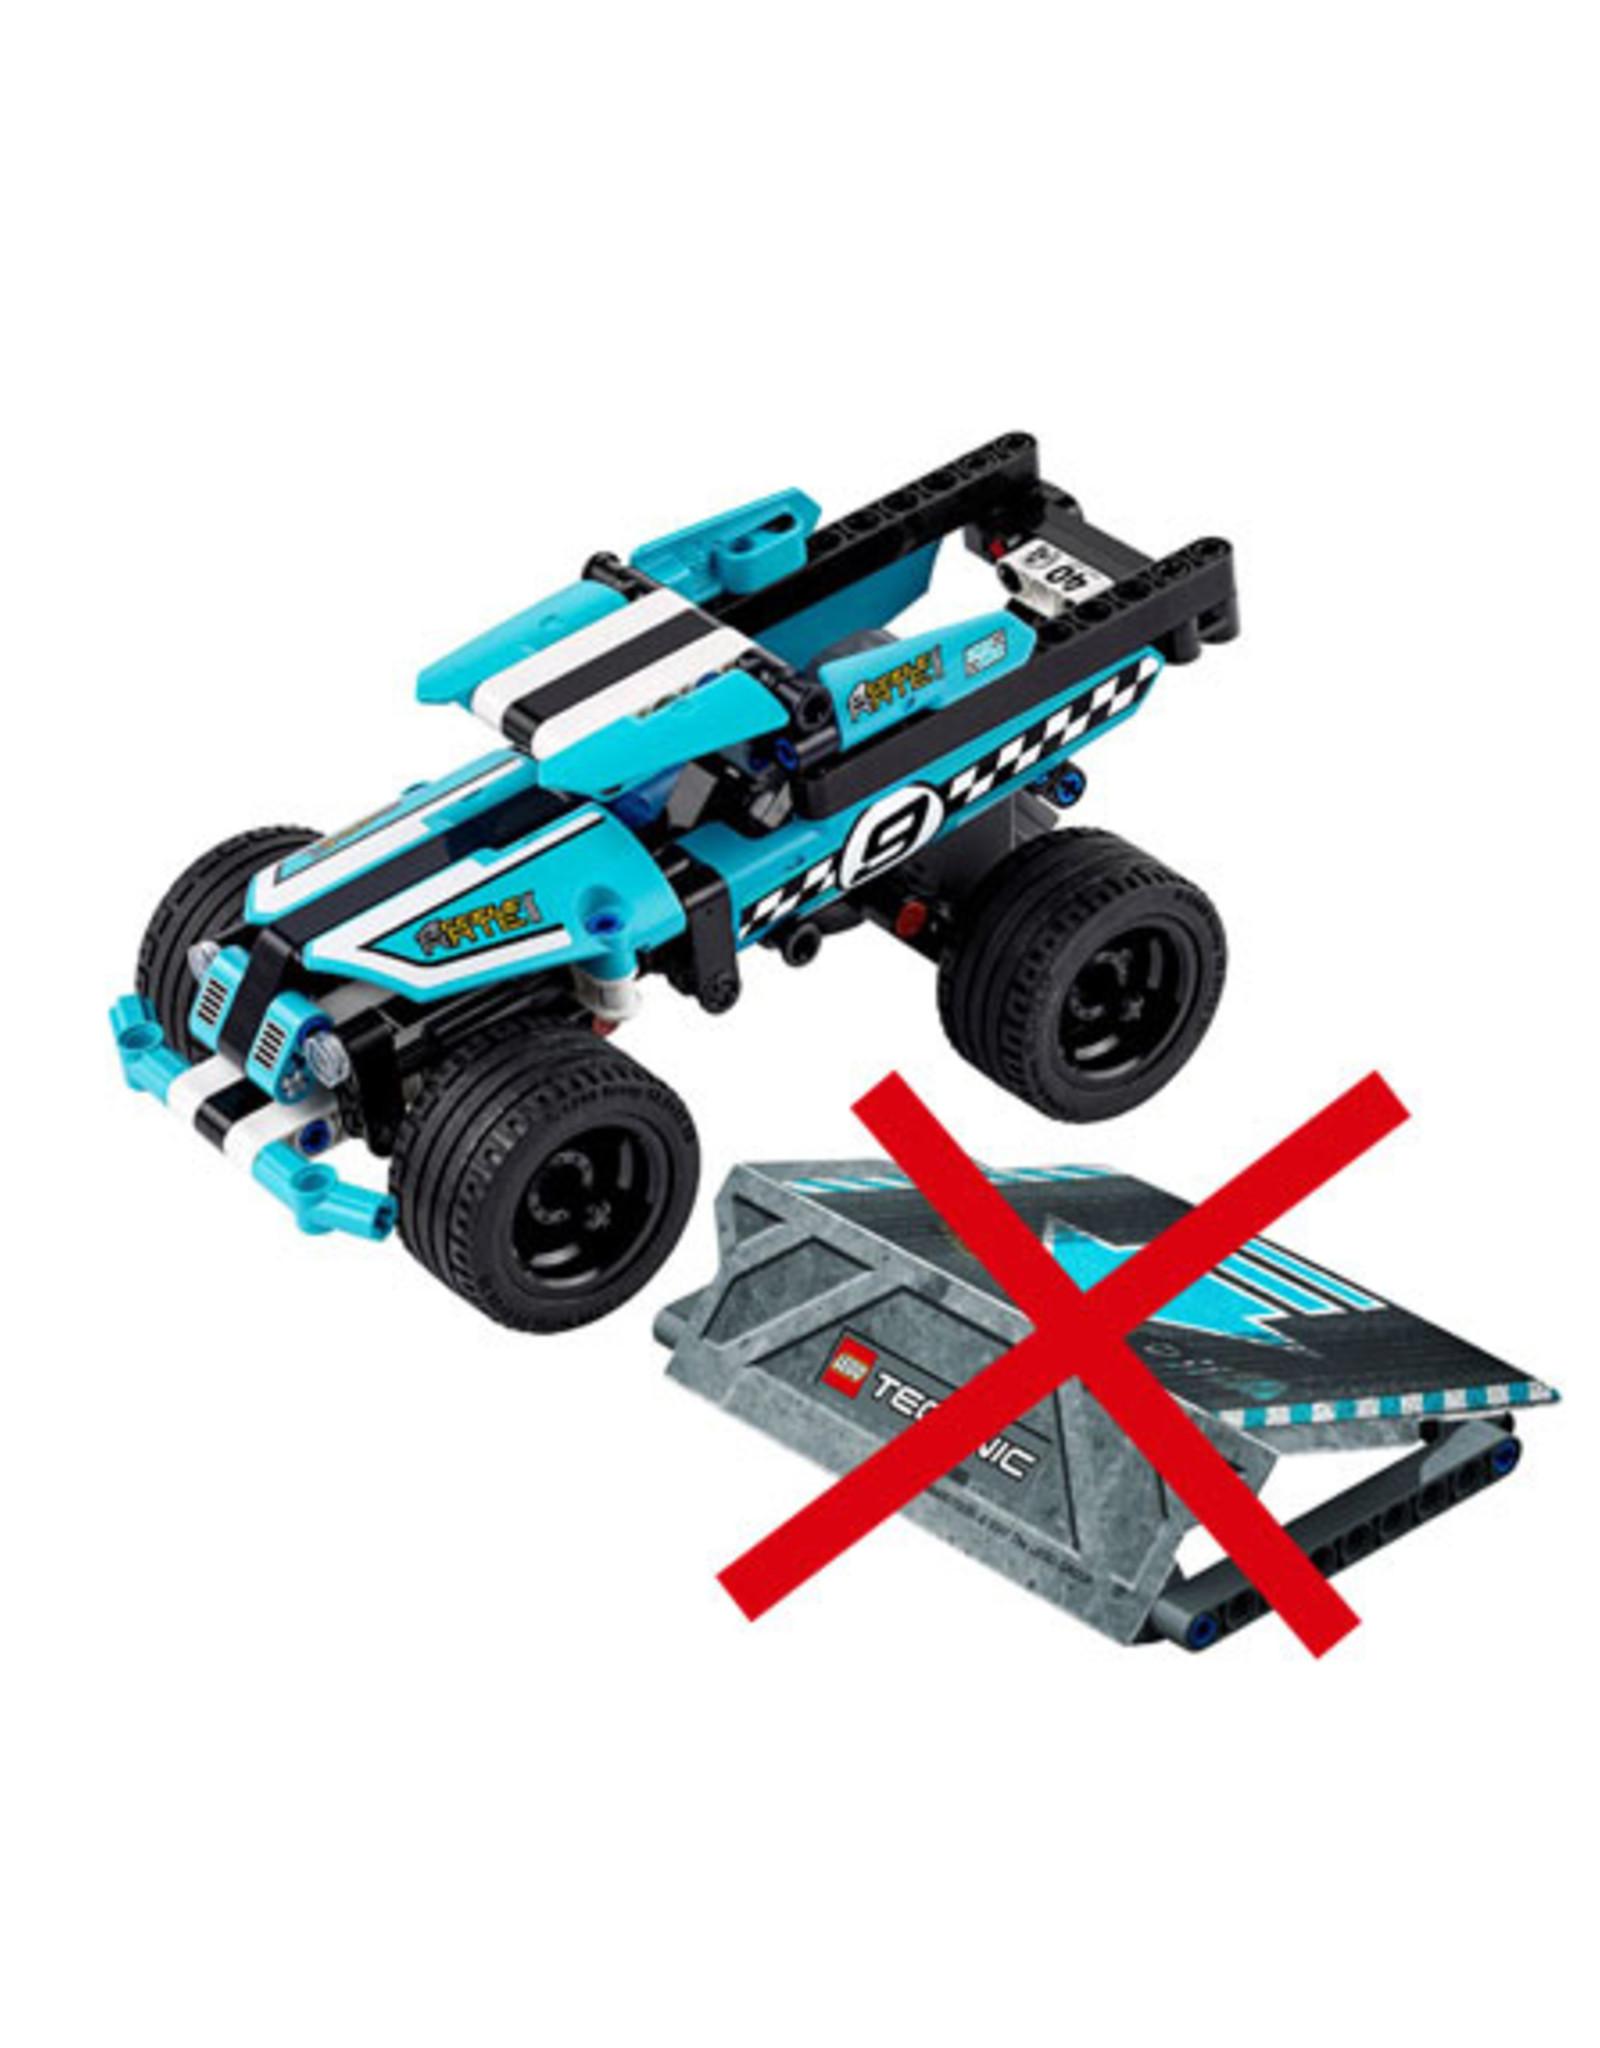 LEGO LEGO 42059 Stunt Truck TECHNIC